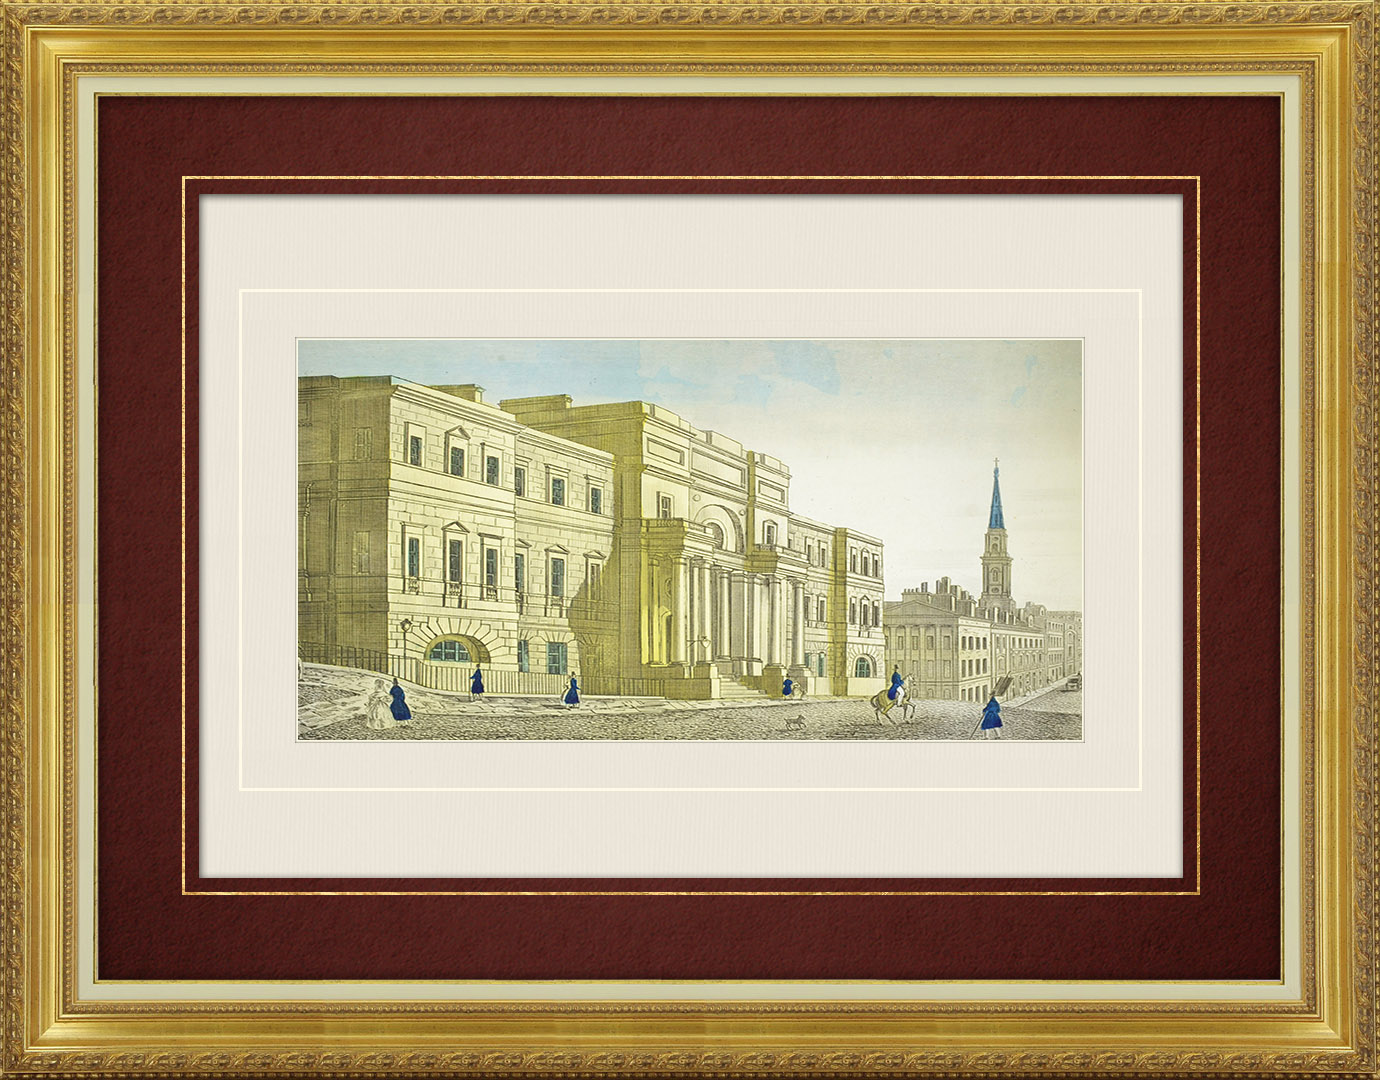 19th Century optical view in original watercolors of the University of Edinburgh (Scotland)